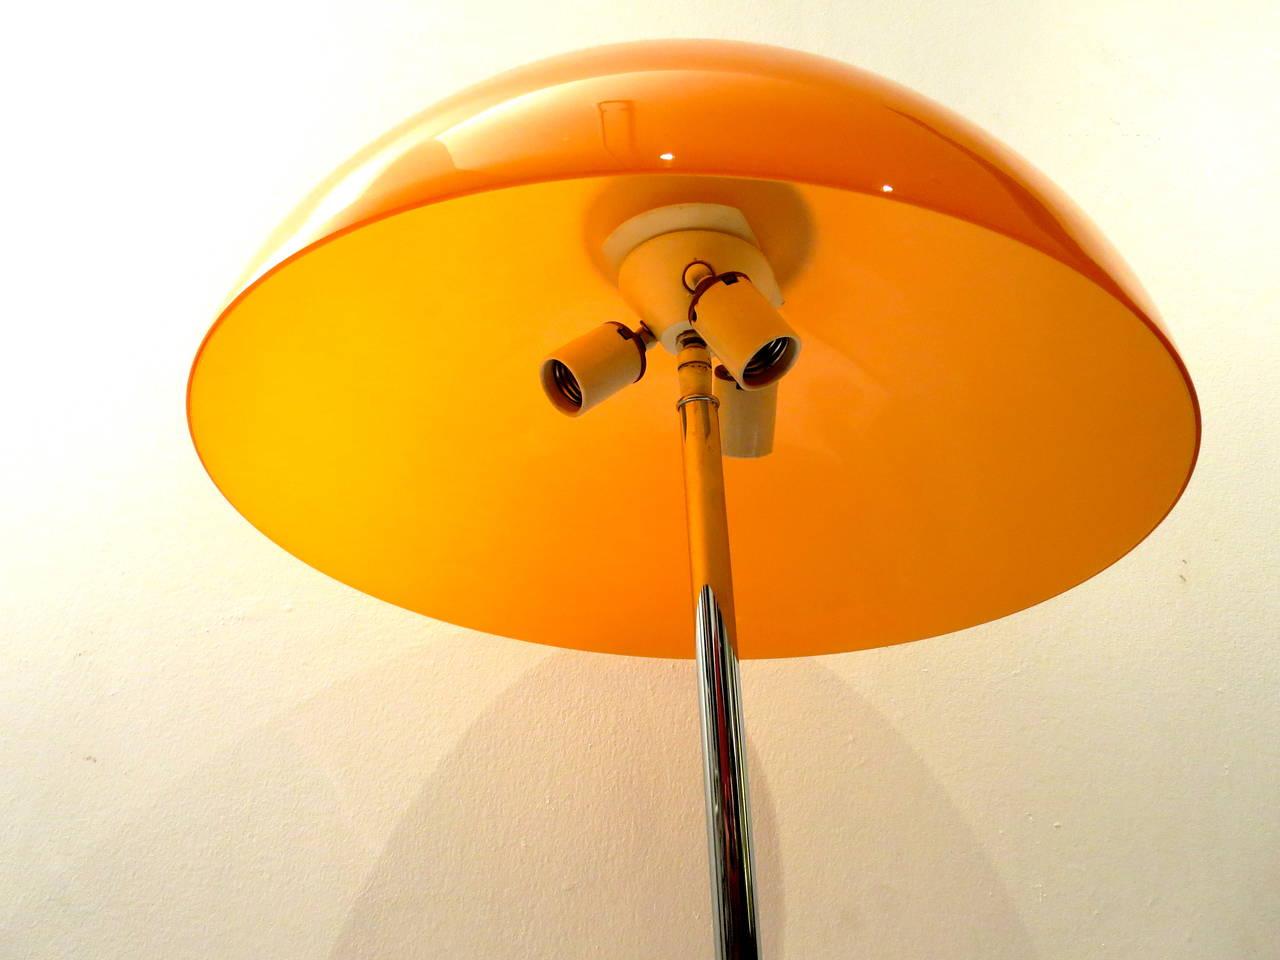 Scandinavian Modern 1960s Pop Desk Lamp In Orange Mushroom Glass Shade U0026  Chrome Stand For Sale